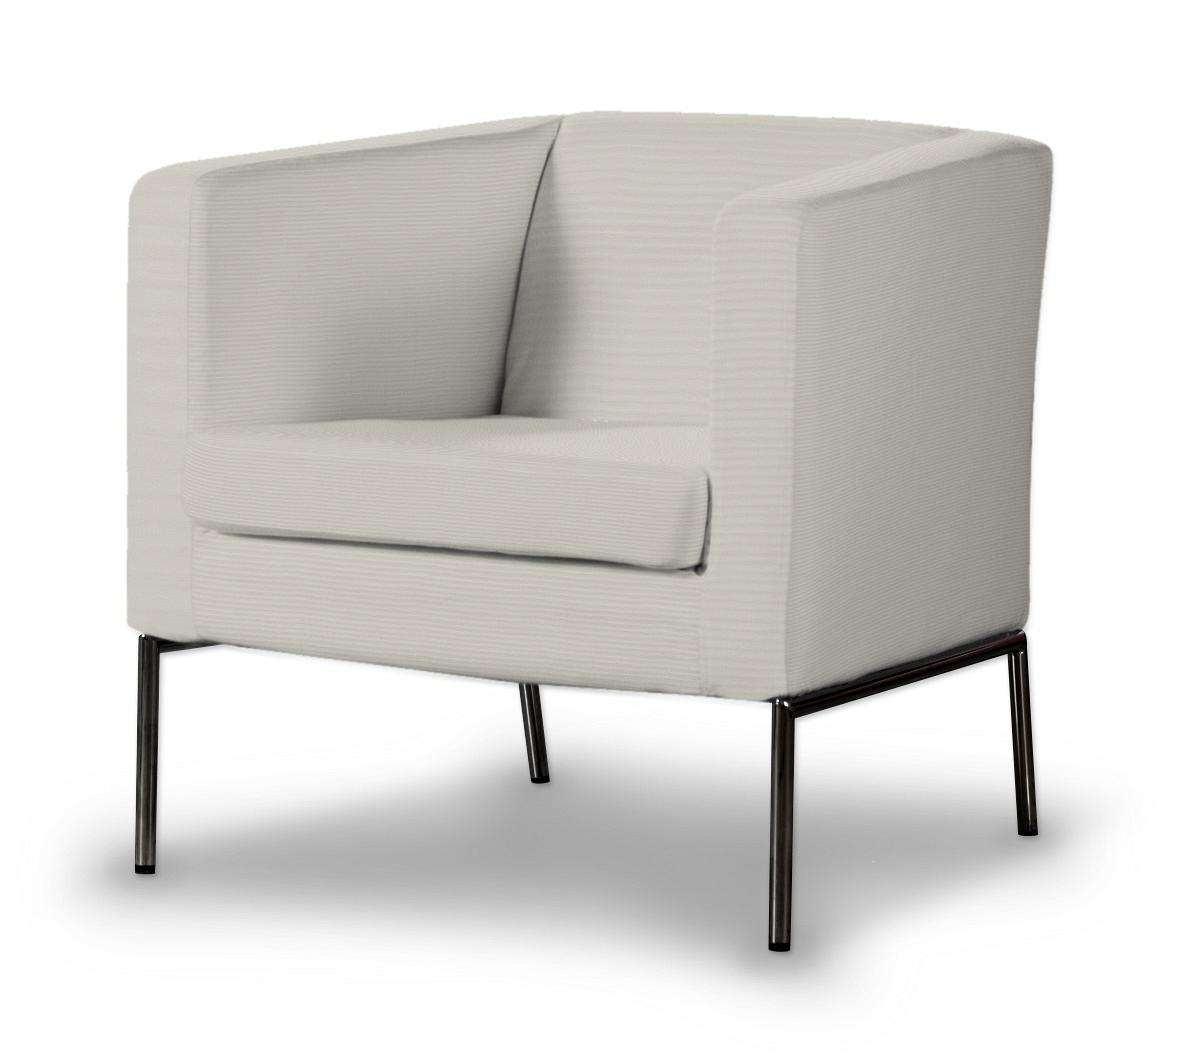 Klappsta betræk lænestol fra kollektionen Cotton Panama, Stof: 702-31